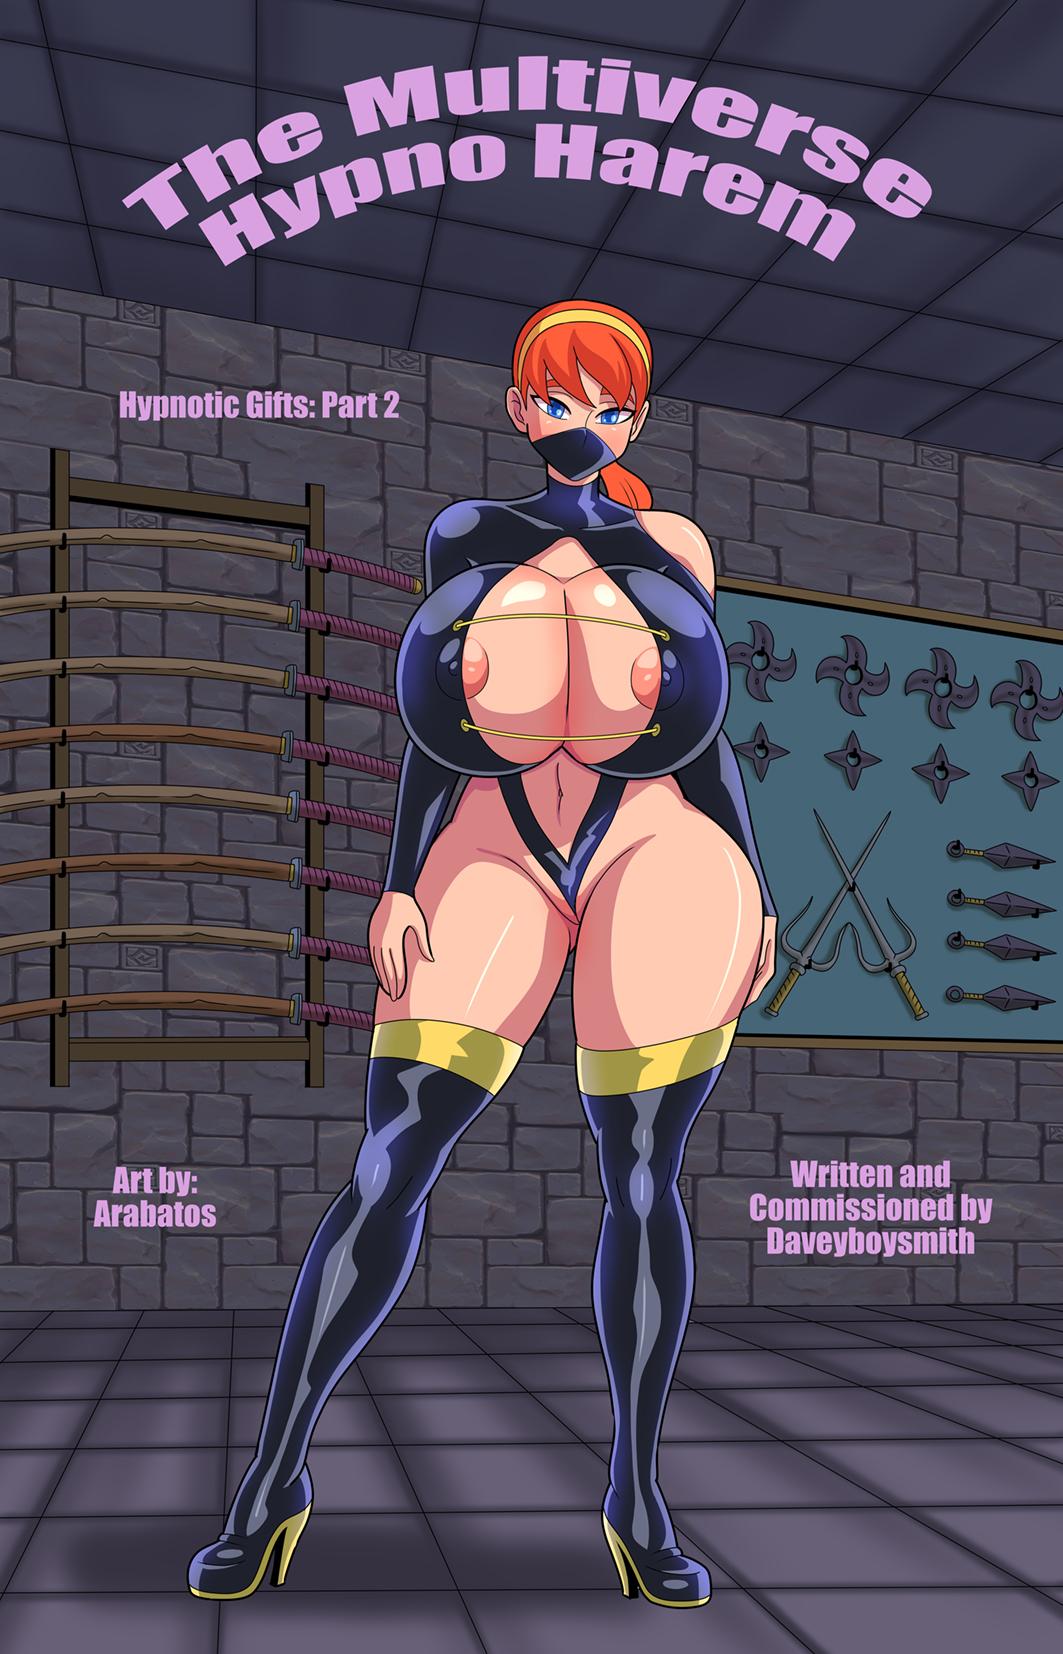 SureFap xxx porno Teenage Mutant Ninja Turtles - [Arabatos] - The Multiverse Hypno Harem 2